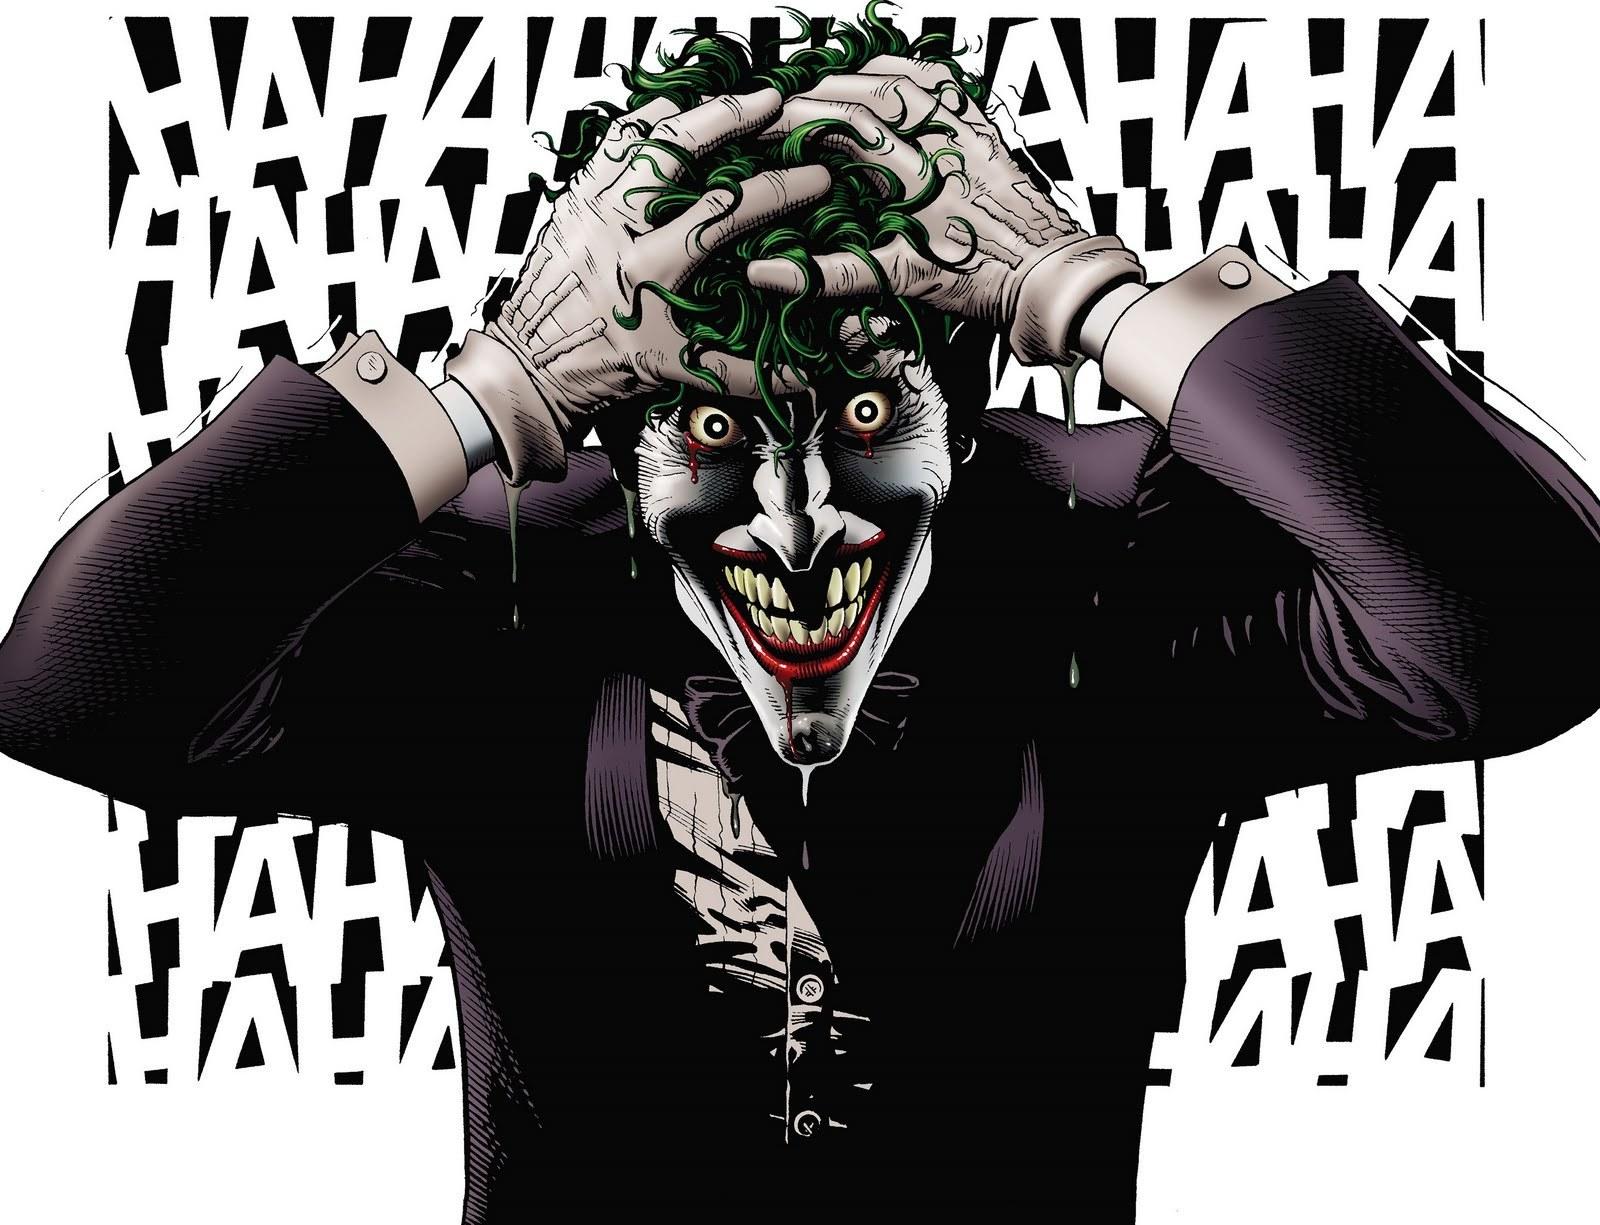 http://images2.fanpop.com/image/photos/13100000/joker-marvel-comics-13157762-1600-1225.jpg